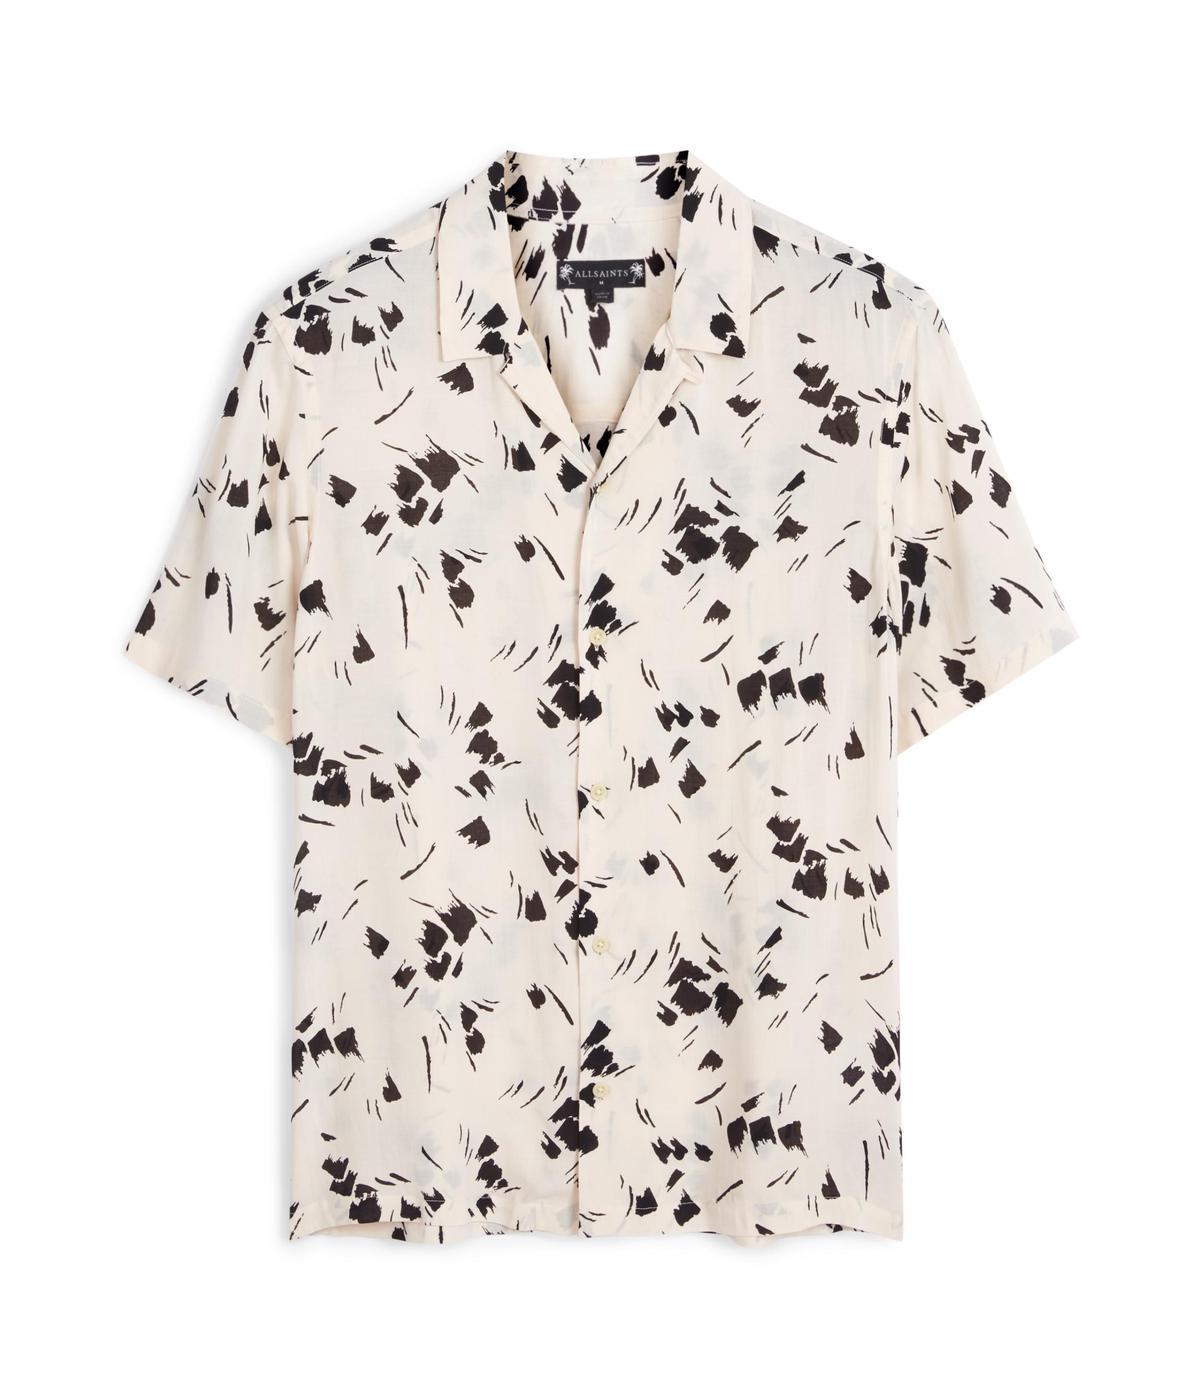 ALLSAINTS Borealis白底印花襯衫。NT$4,800(ALLSAINTS提供)